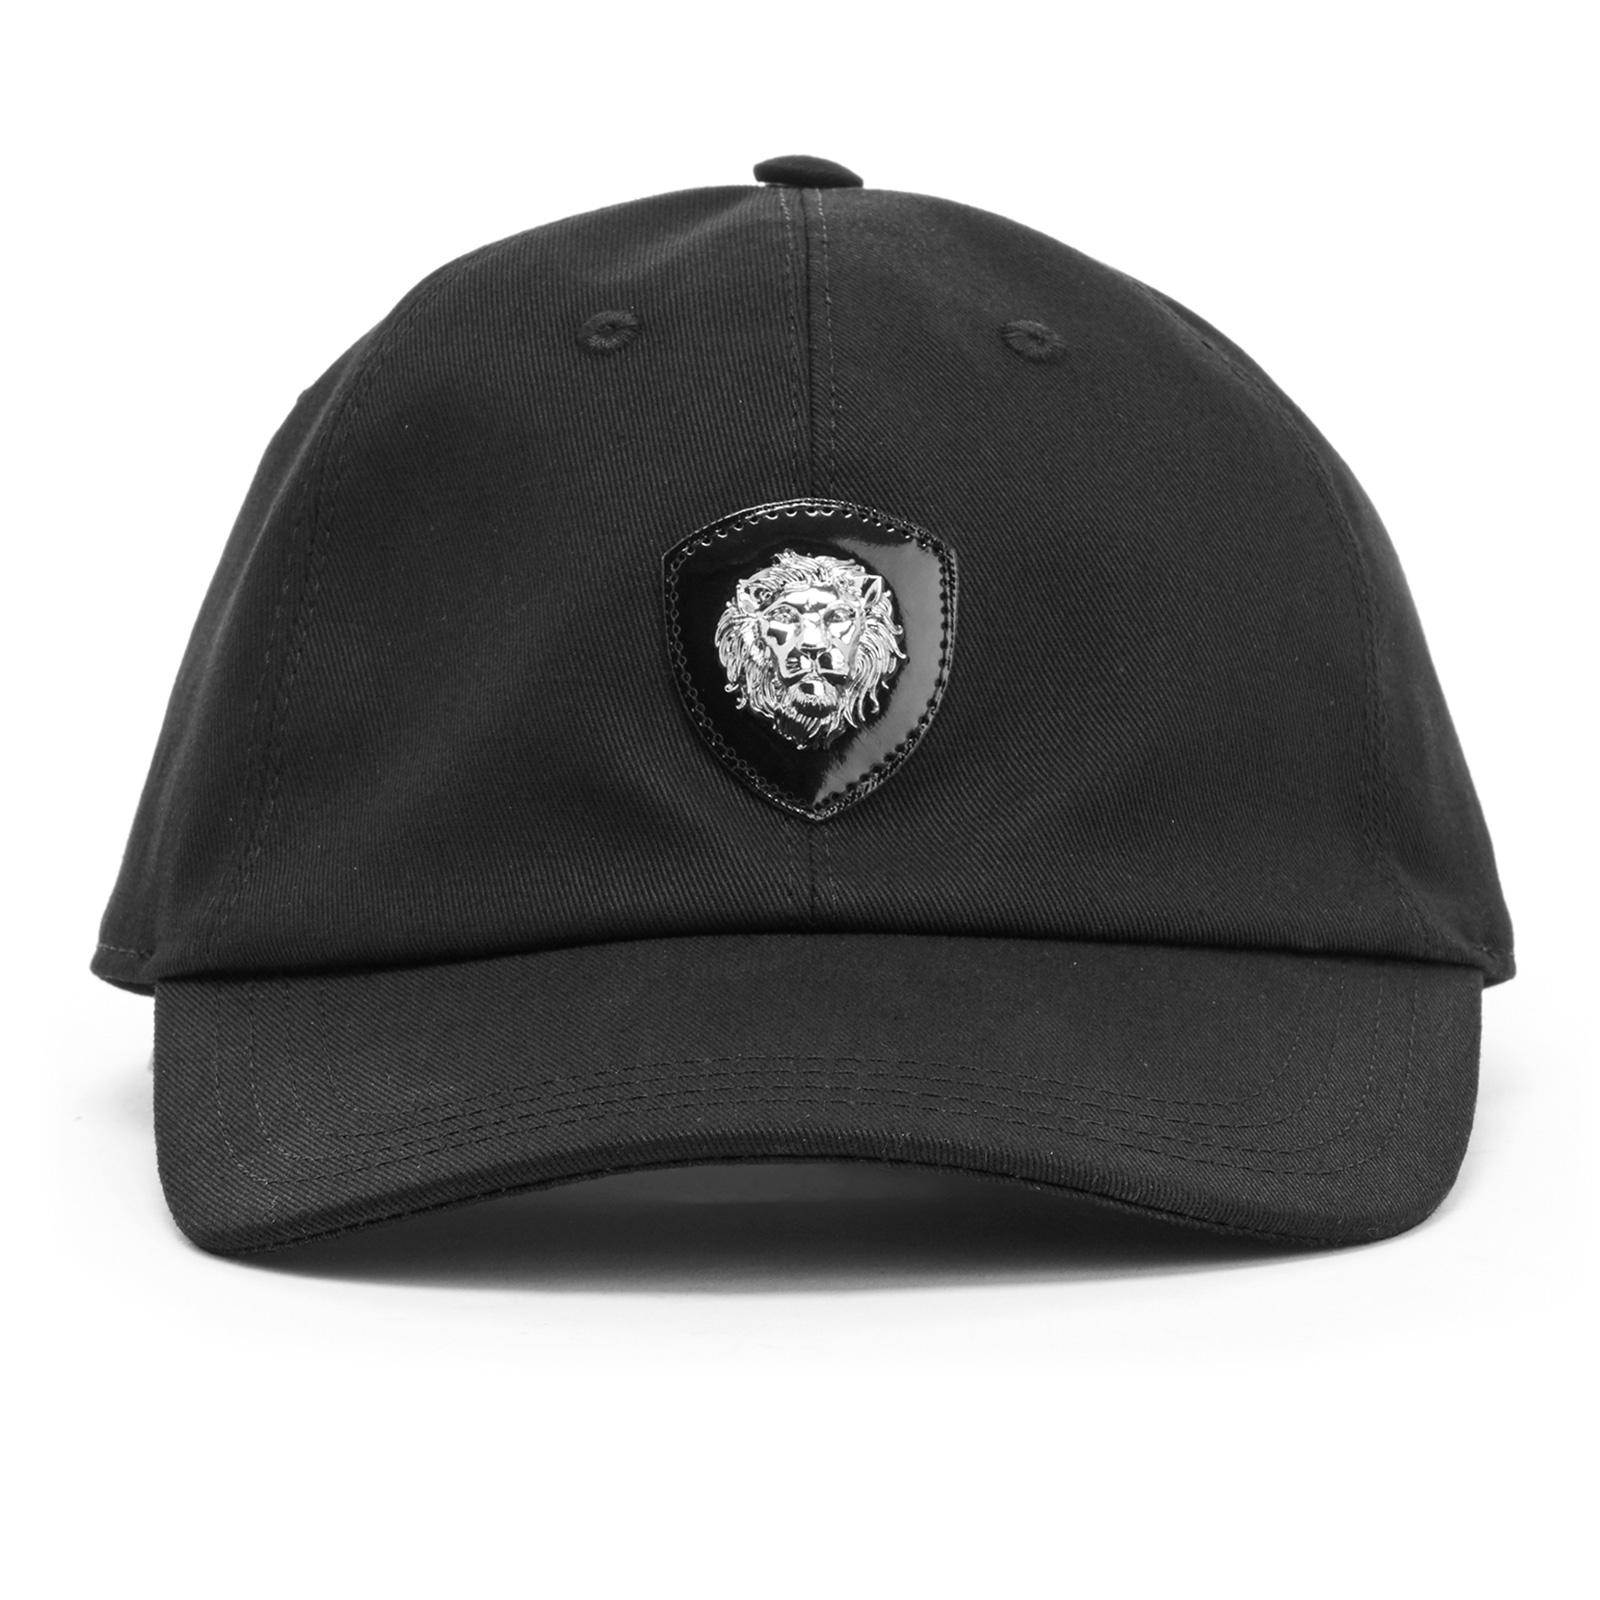 4246819ccdf Versus Versace Men s Lion Logo Cap - Black - Free UK Delivery over £50